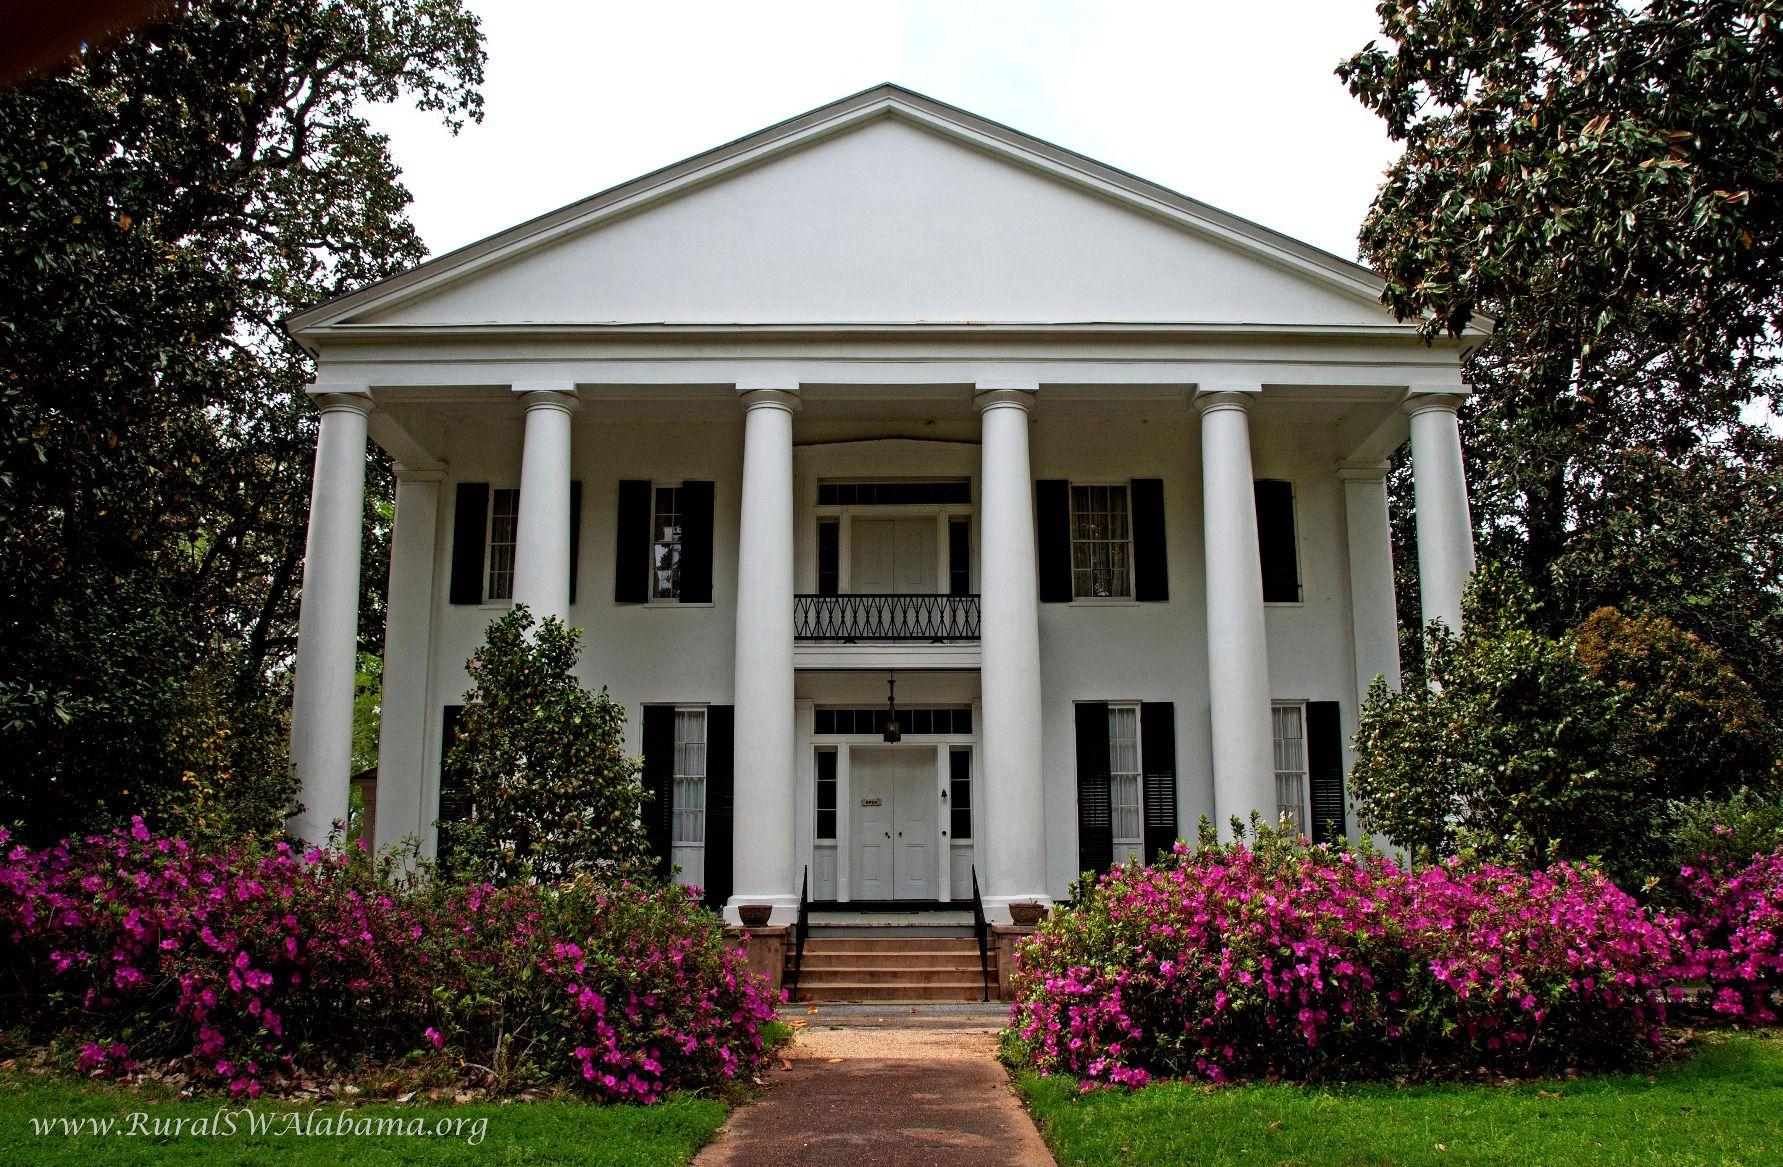 Pin on Alabama Travel Ideas